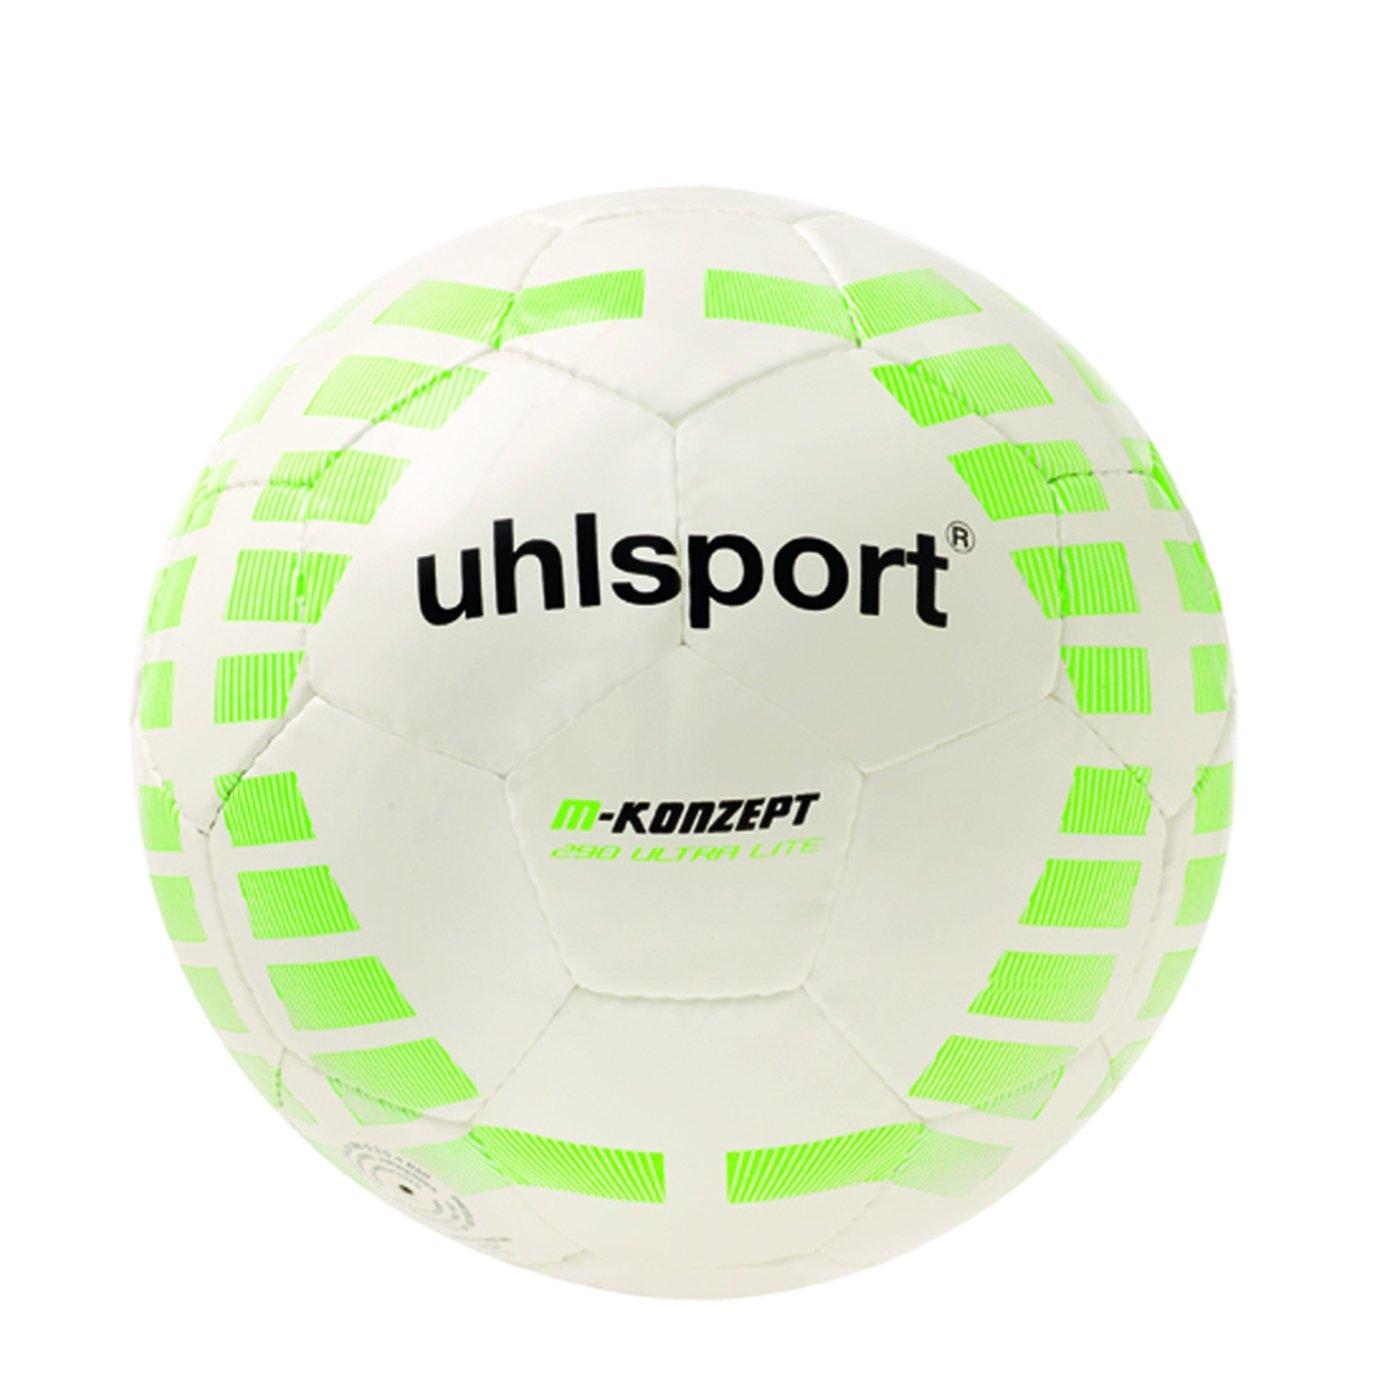 Uhlsport M-KONZEPT 290 ULTRA LITE - Balón de fútbol blanco weiss ...